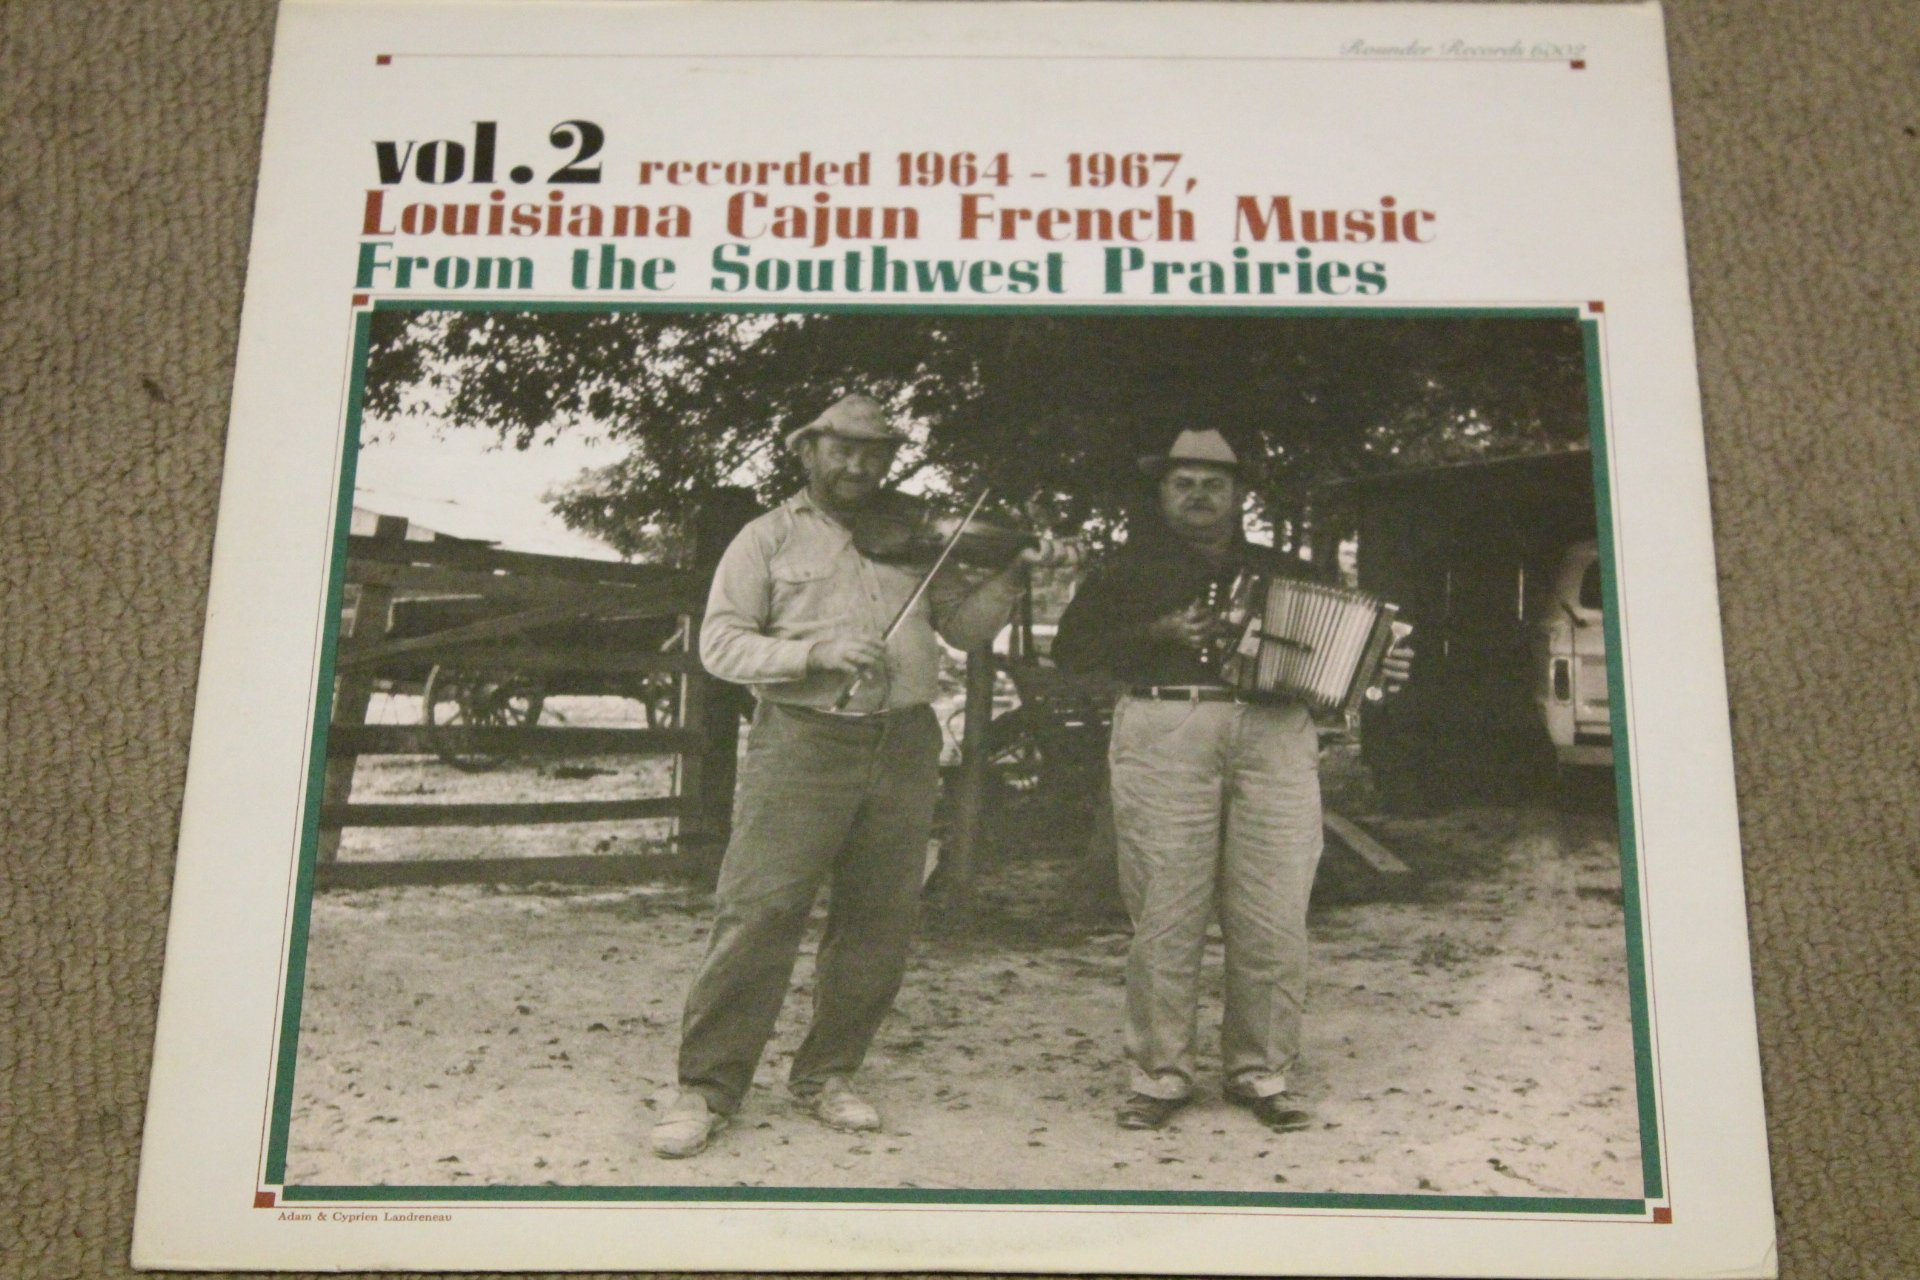 Louisiana Cajun French Music, Vol. 2: Southwest Prairies, 1964-1967 [Vinyl]